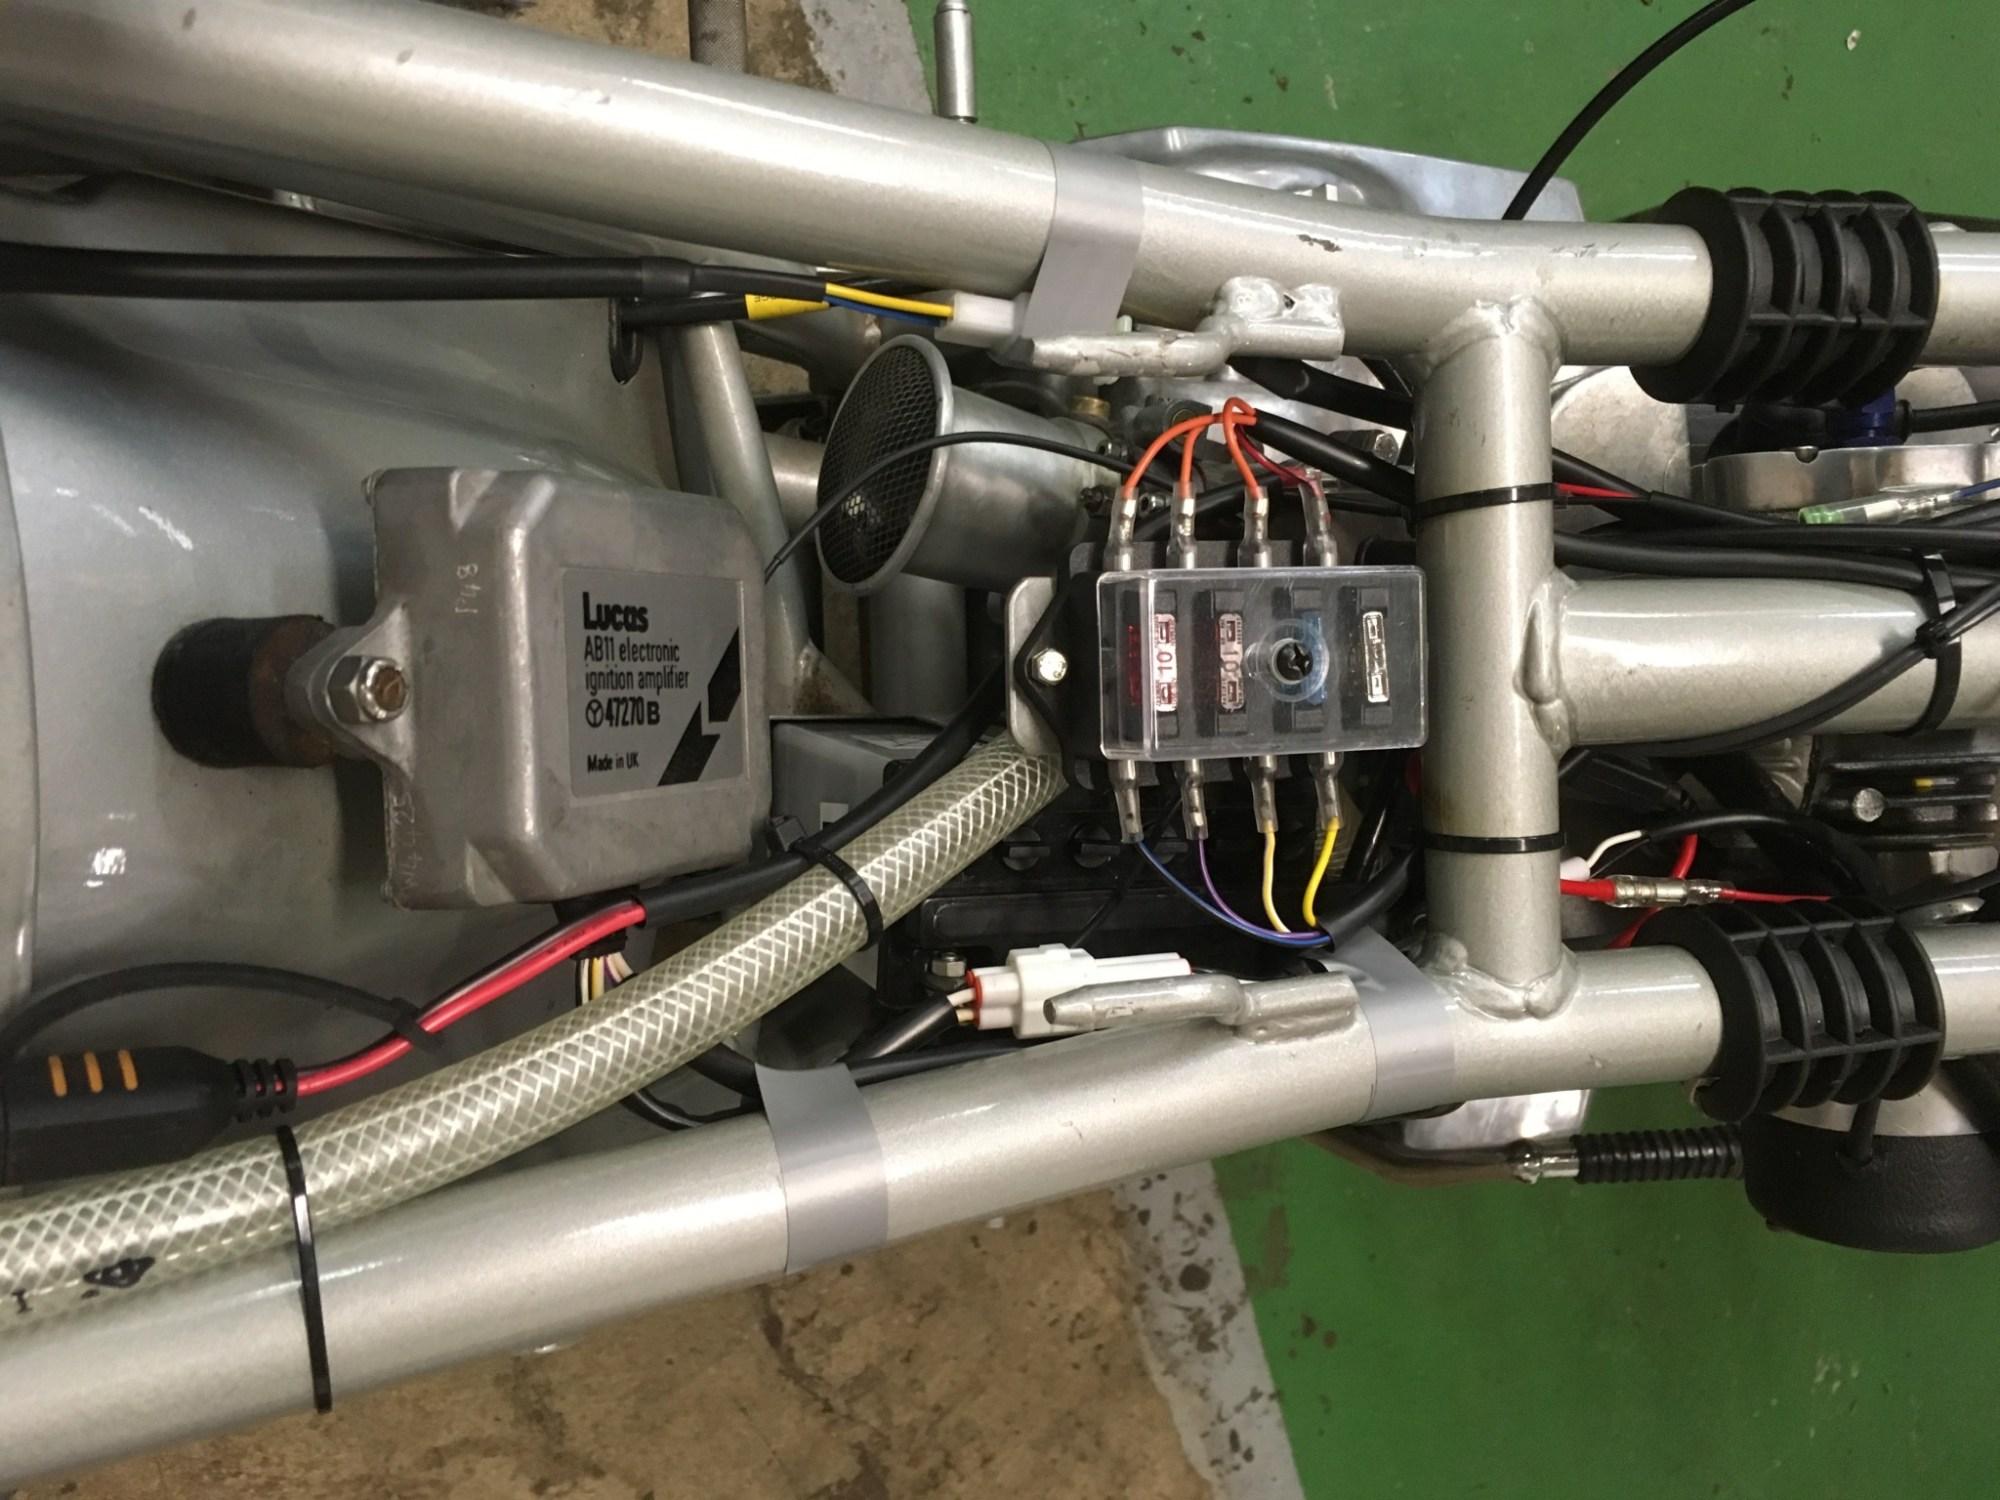 hight resolution of ducati hypermotard 1100 wiring diagram schematic diagramducati hypermotard fuse box wiring diagram ducati hypermotard 1100 top